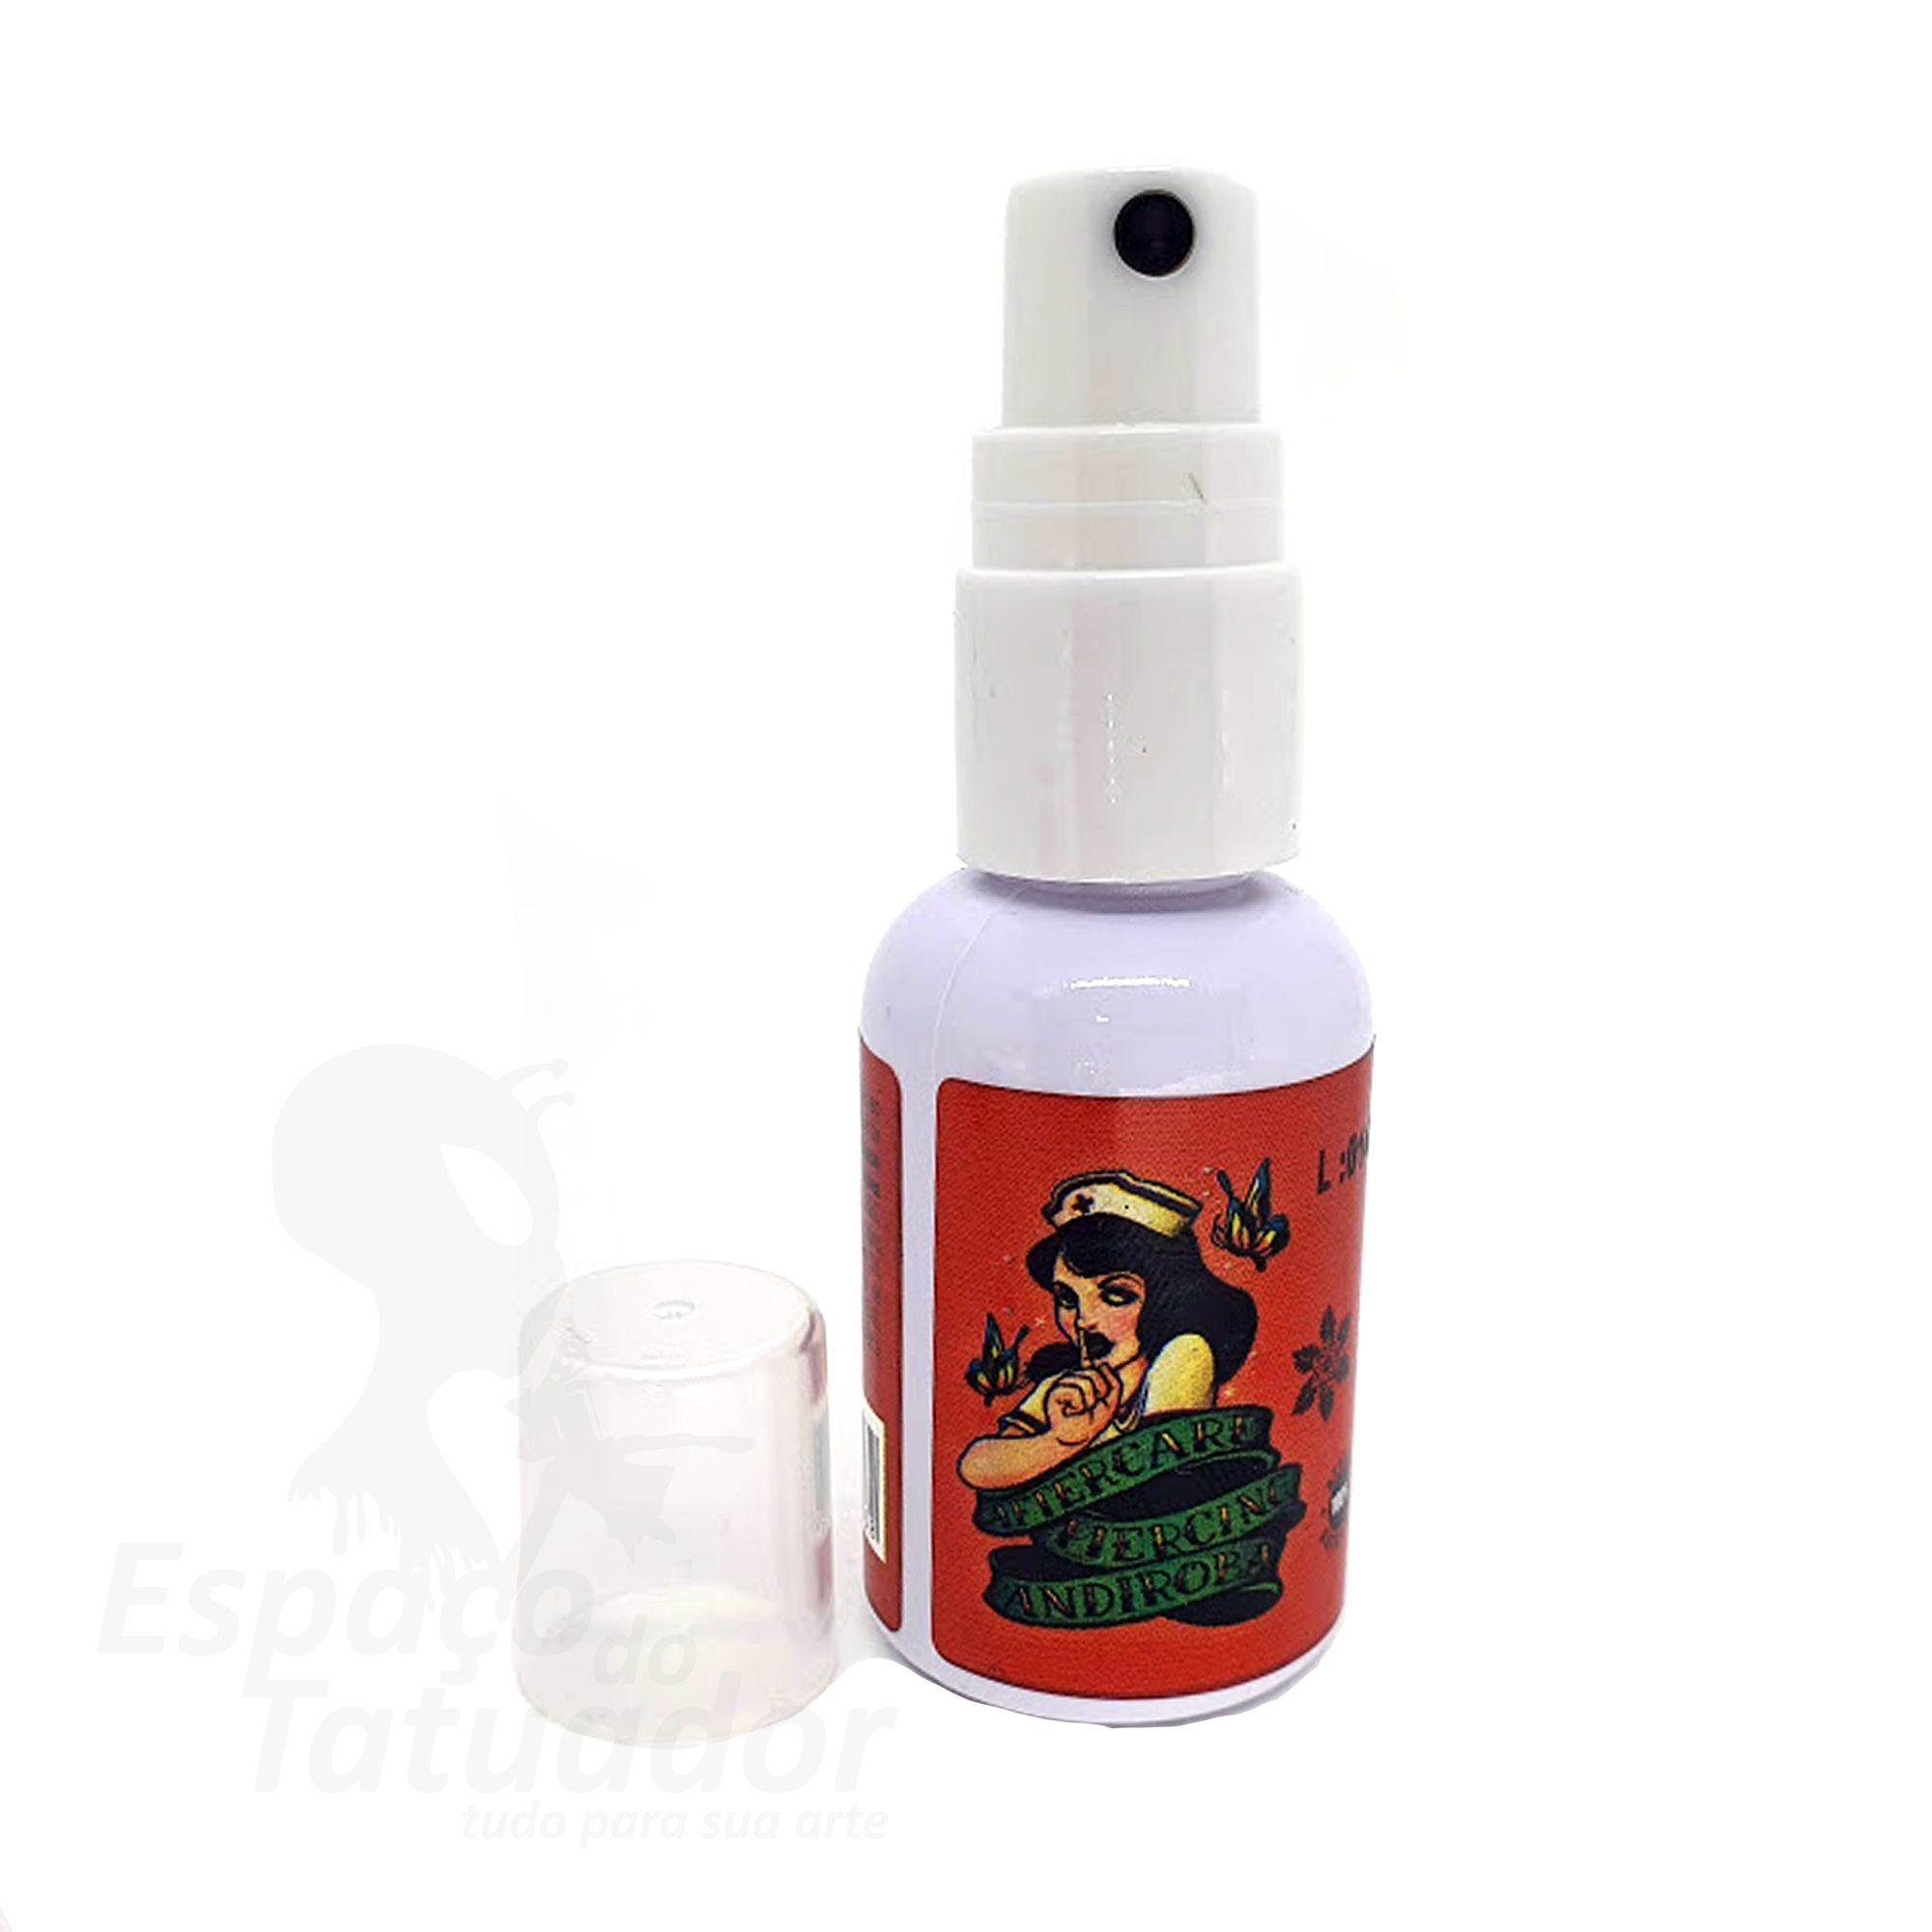 Aftercare Andiroba Spray 30ml (vál. 10/21)